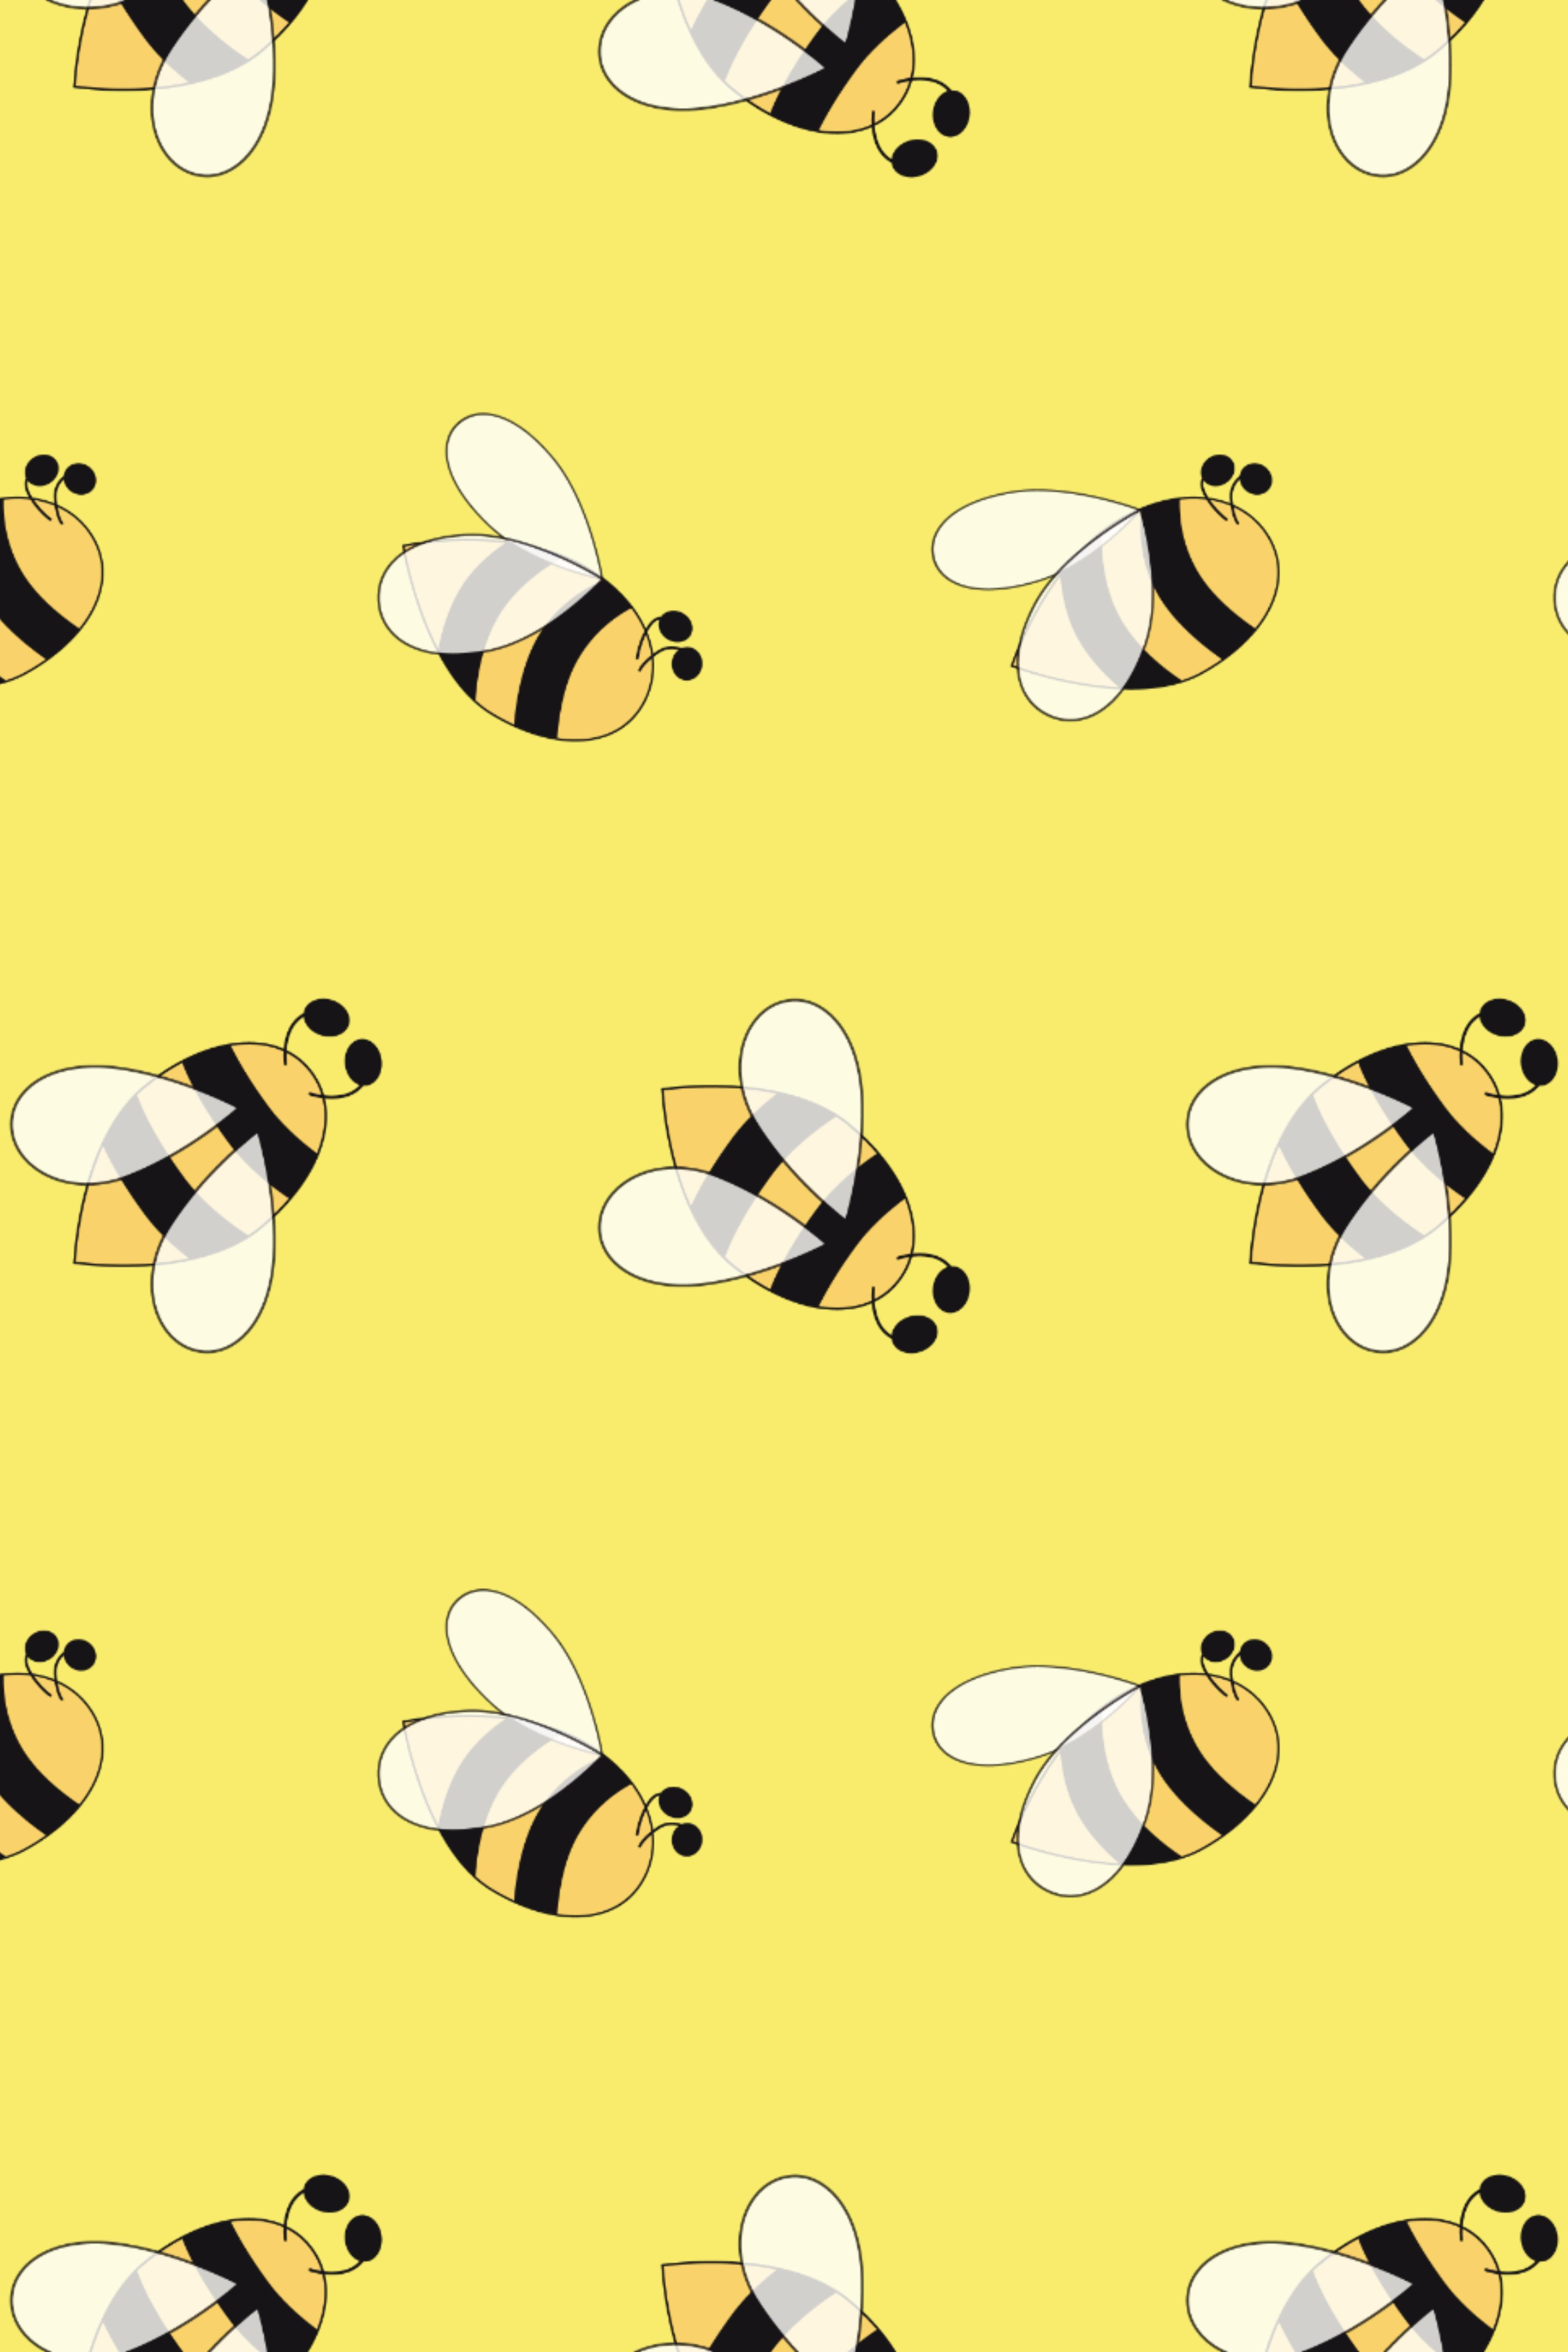 10 Honey Bee Patterns Cute Bee Cute Patterns Wallpaper Cute Wallpapers Cute Bee